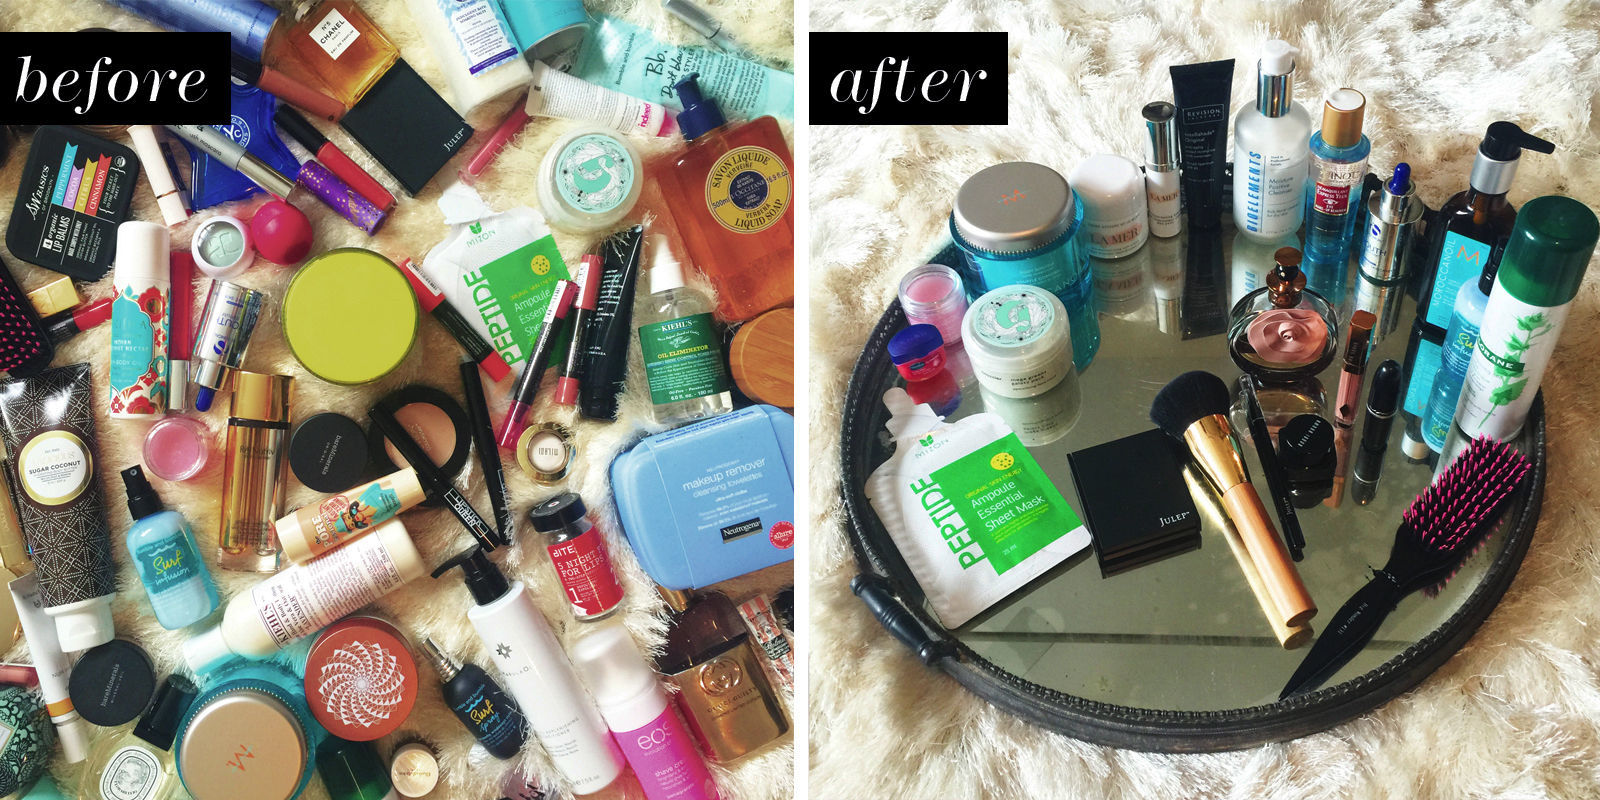 D Fashion Beauty Supply: KonMari Tidying Up Method